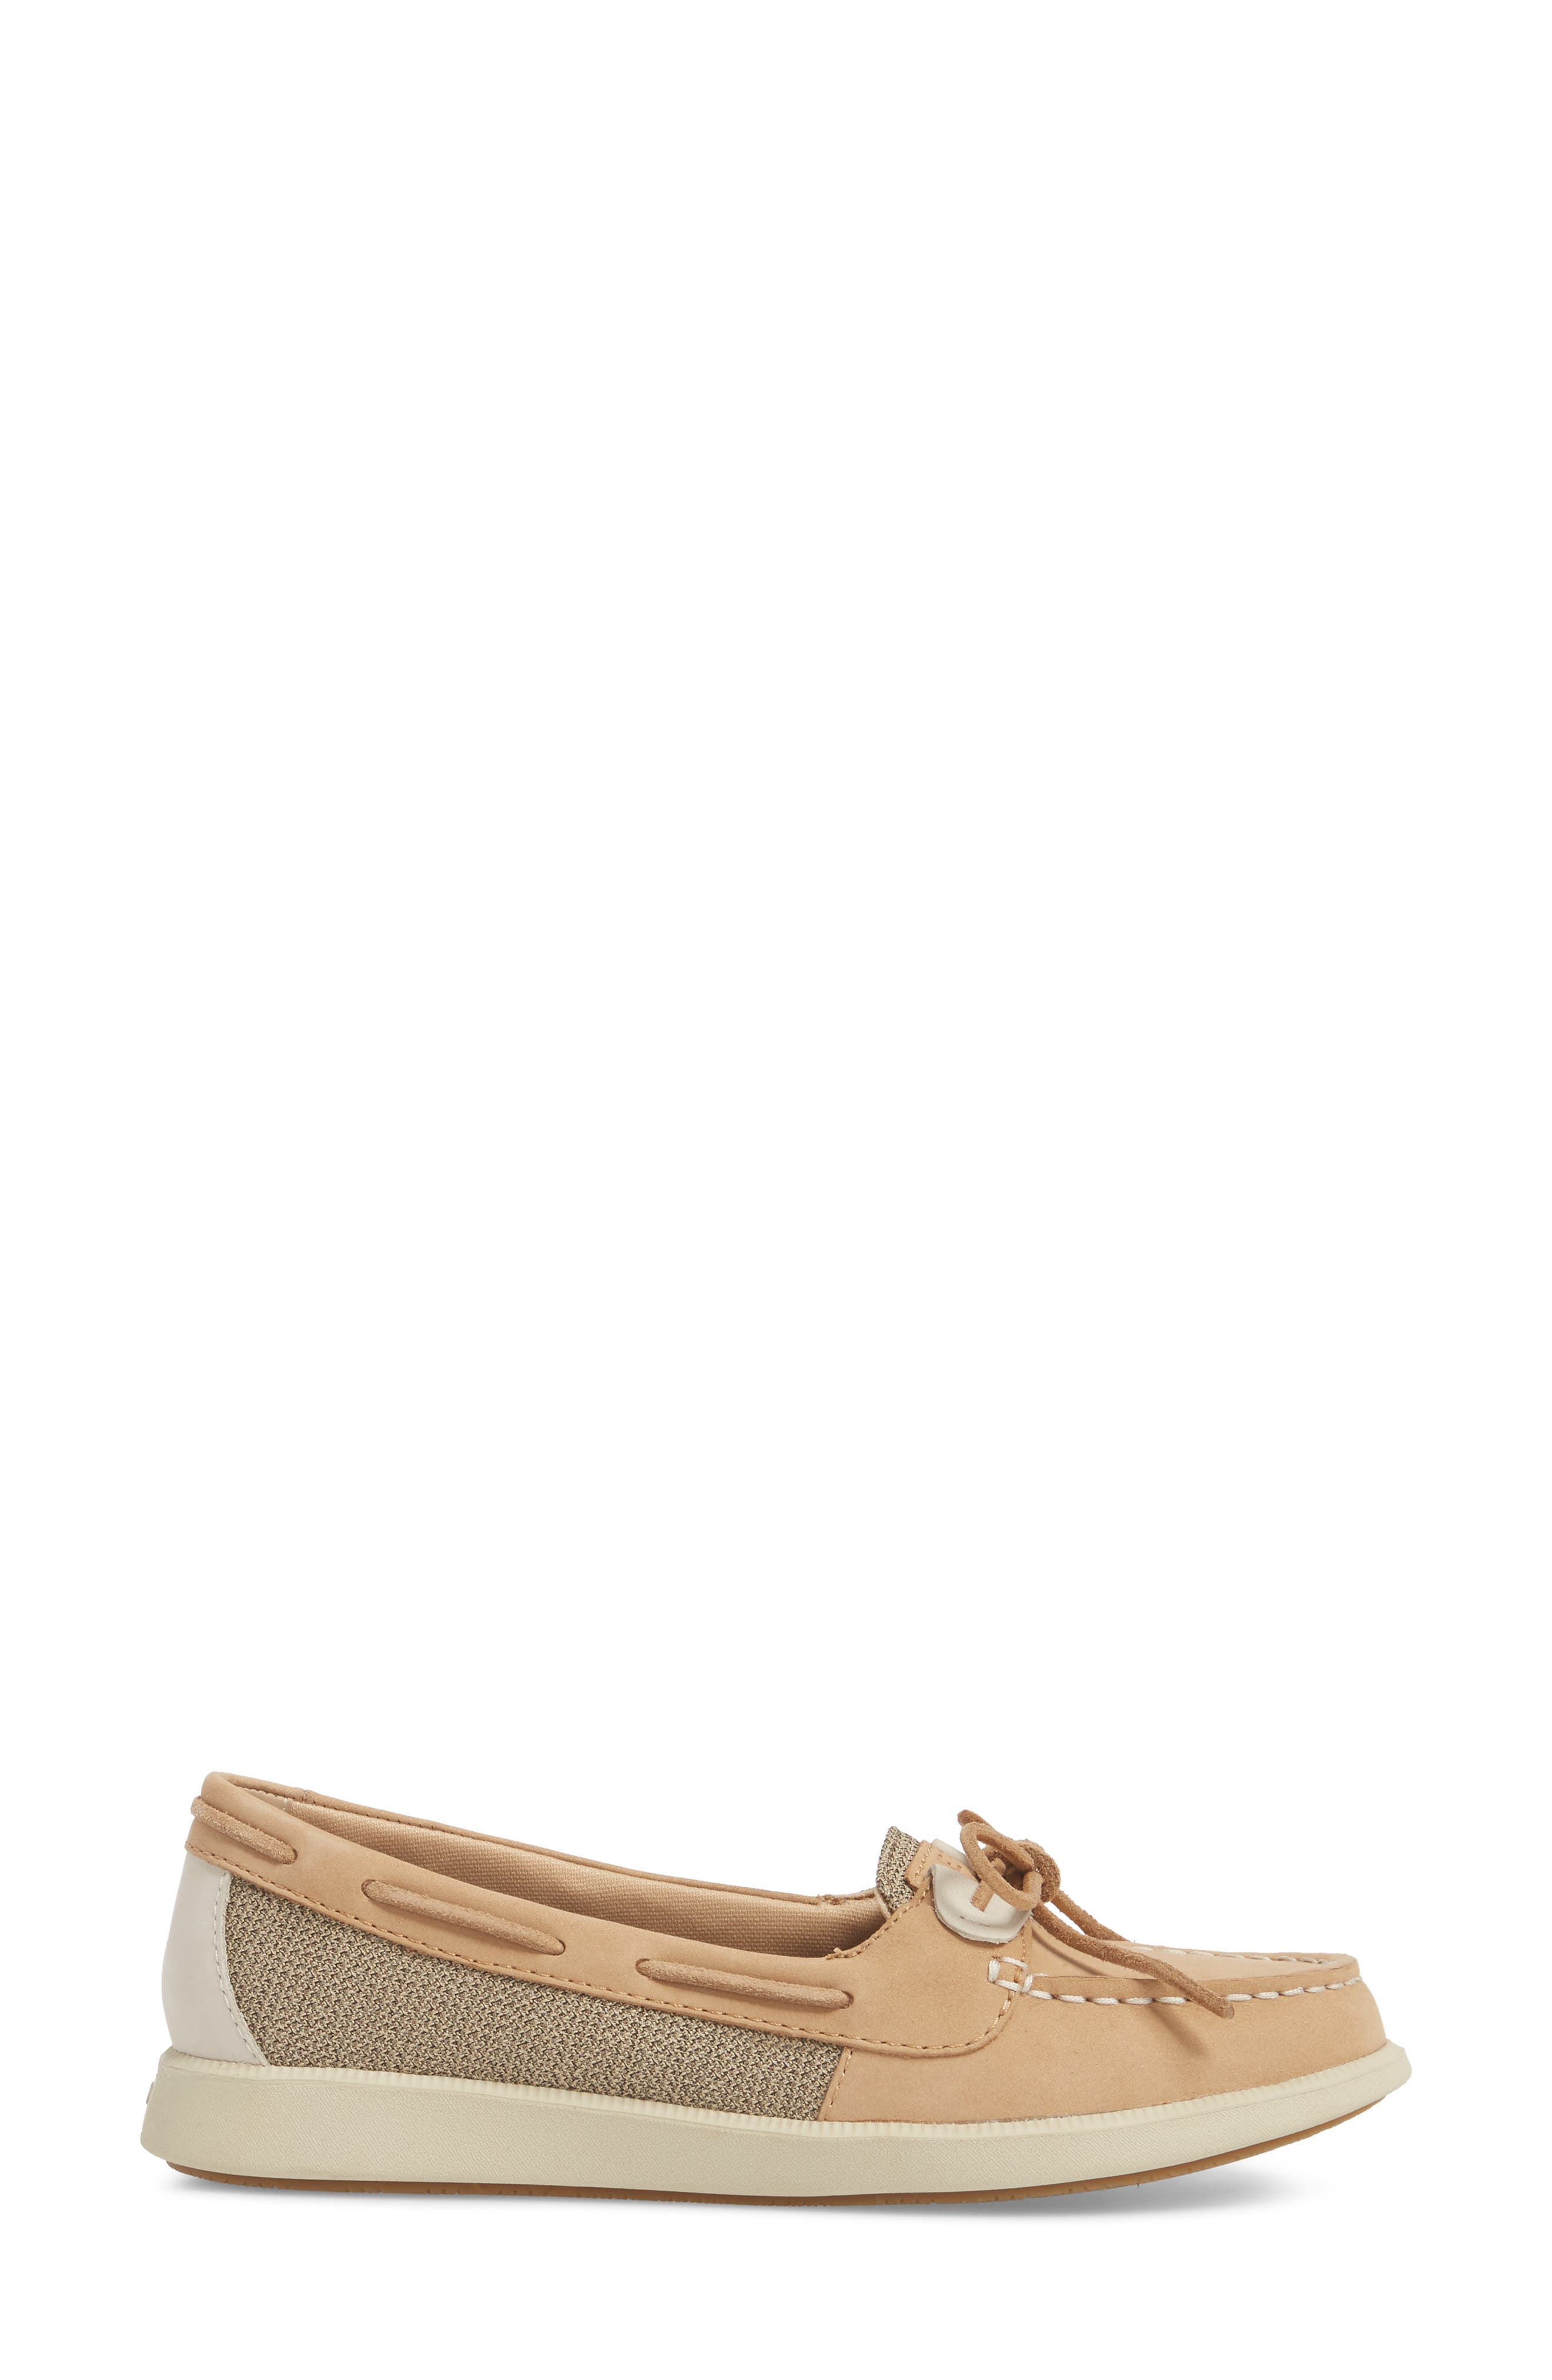 Oasis Boat Shoe,                             Alternate thumbnail 3, color,                             LINEN OAT LEATHER